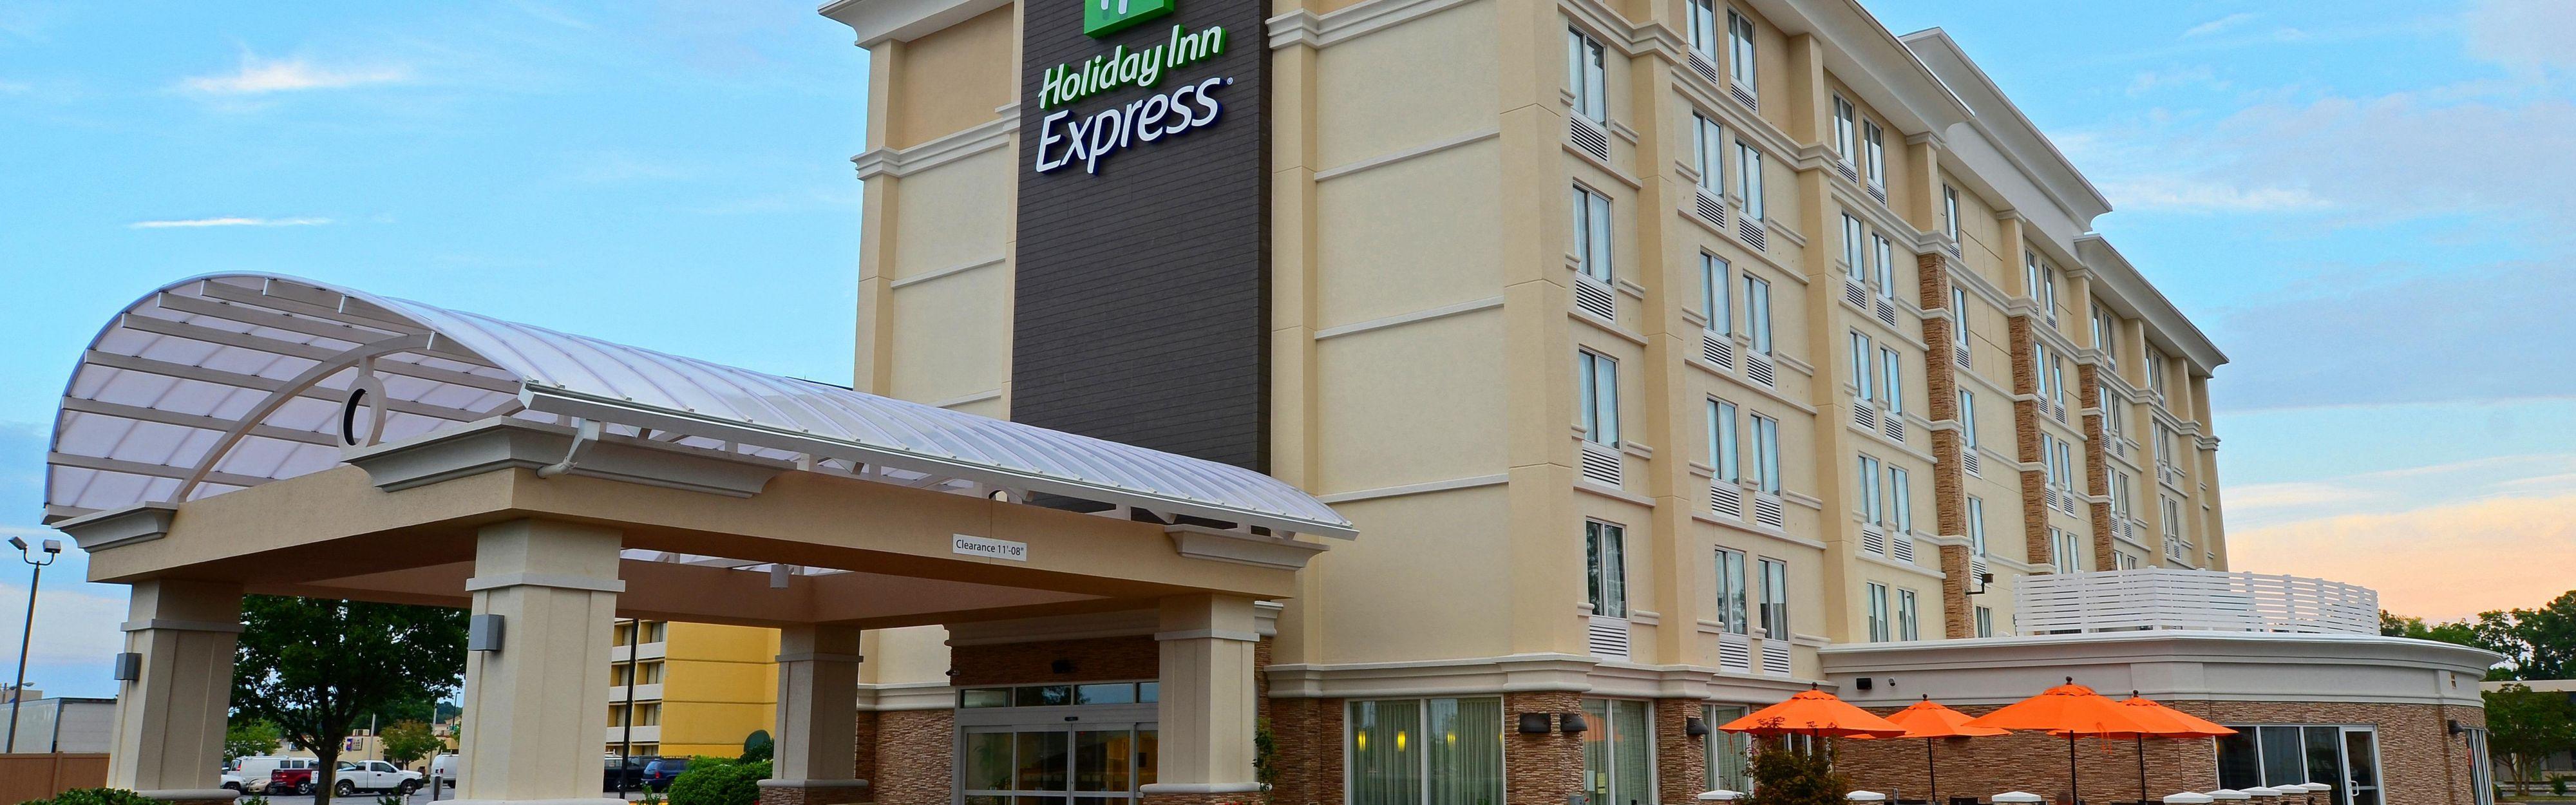 Holiday Inn Express Hampton - Coliseum Central image 0